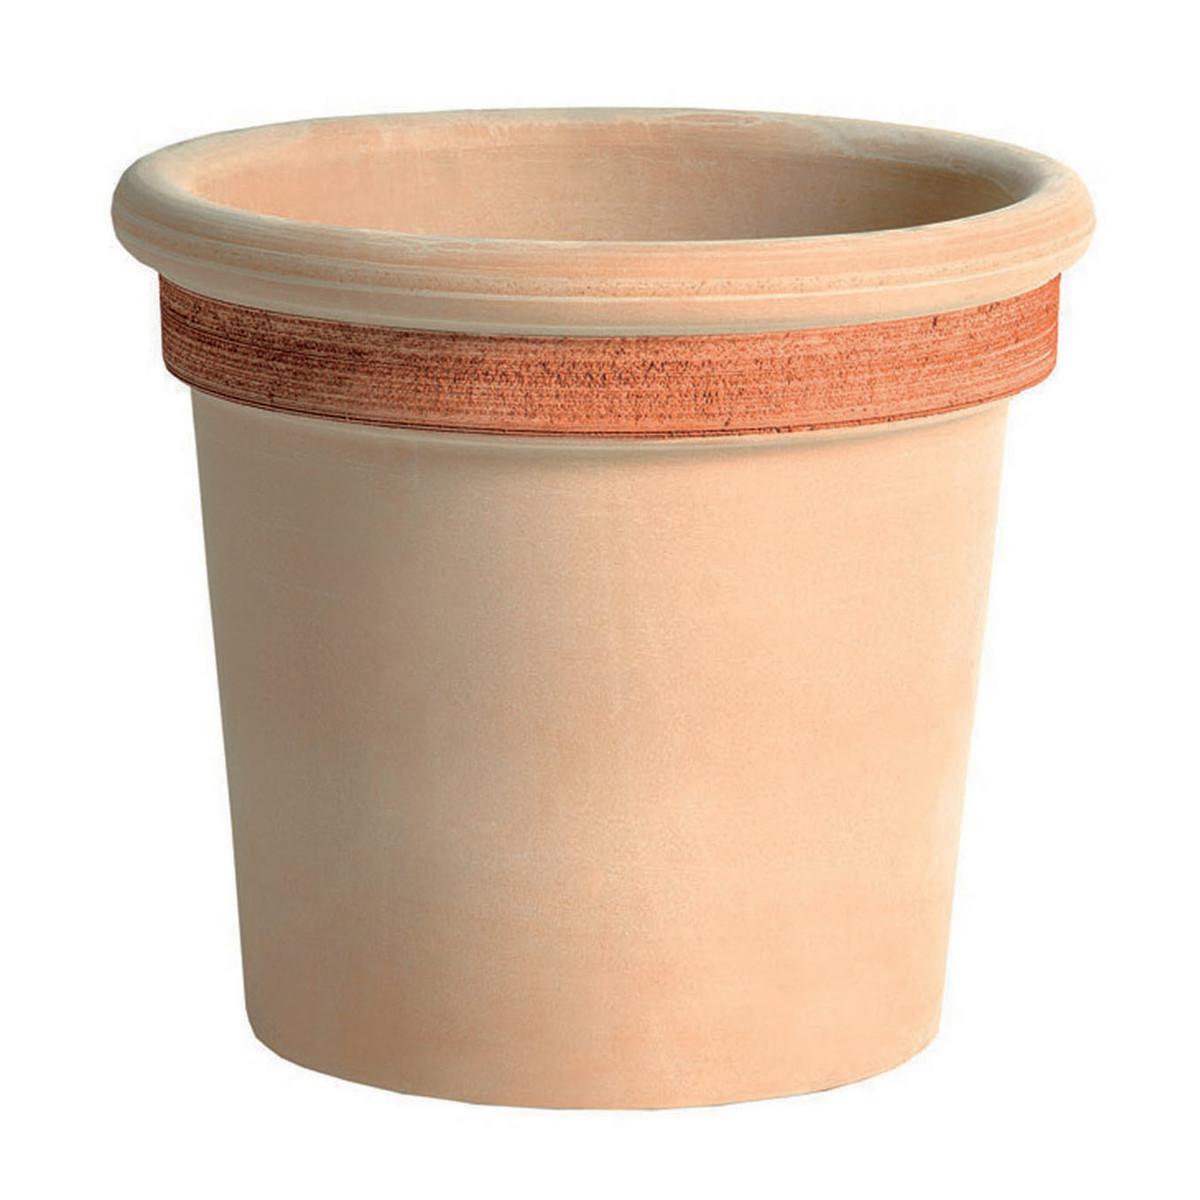 Vasi alti graffiati cm 26 moka prezzo e offerte sottocosto for Vasi in terracotta leroy merlin